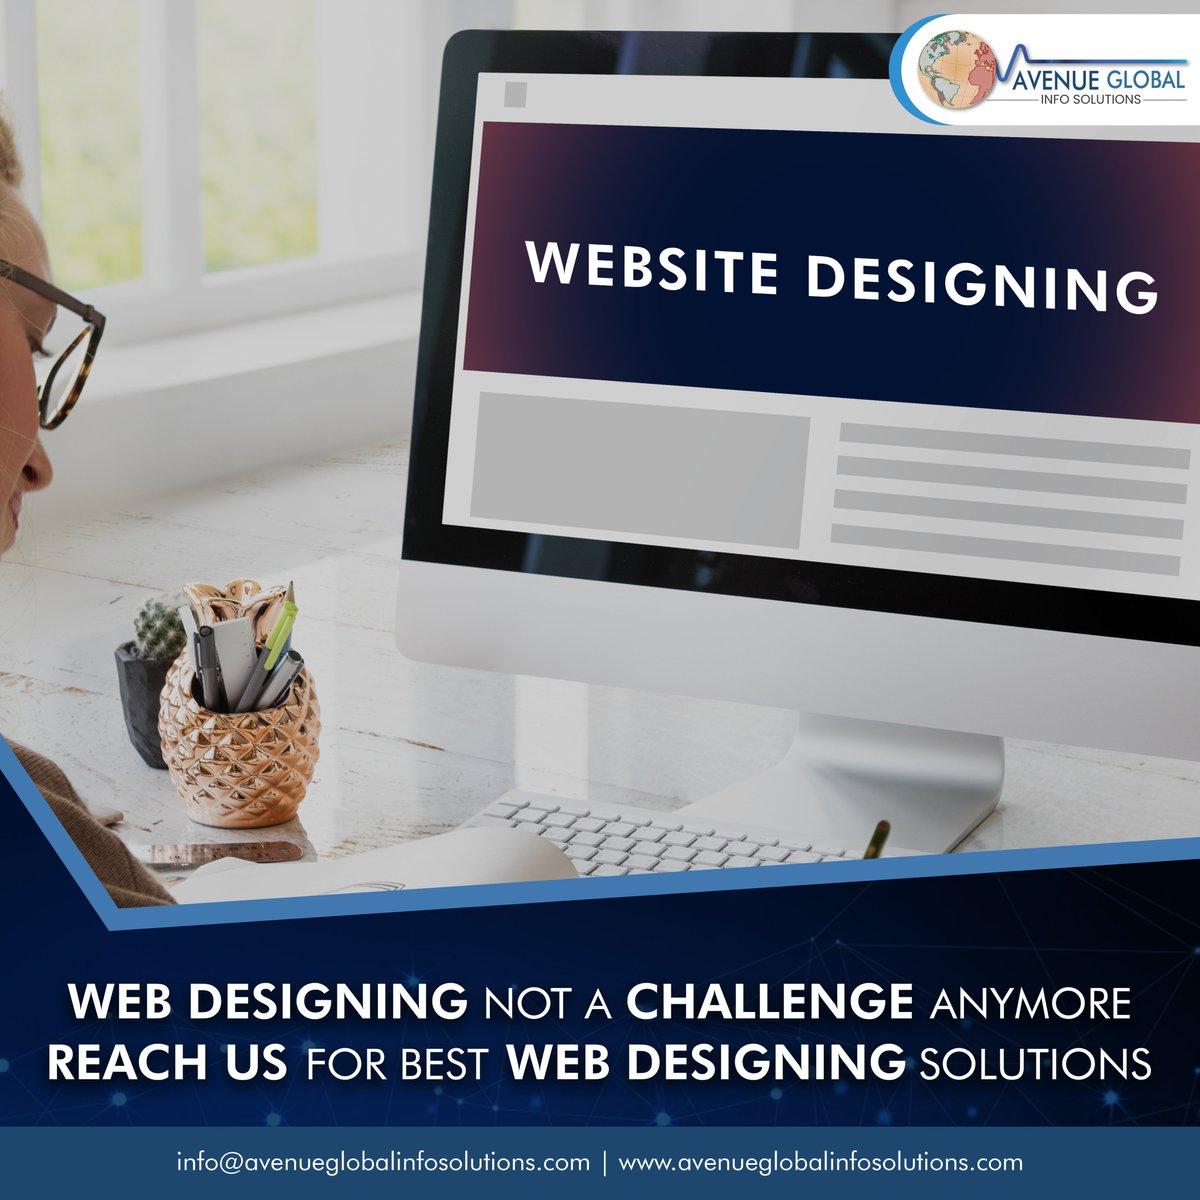 Get best #webdesigning from Avenue Global Info Solutions  #webdesign #whywebdevelopment #Digitalmarketing #webdesigncompany #websitedeveloper #webdesigntips #instatech #instatechno #Avenueglobalinfosolutions #avenueglobal #Websitedevelopment #websitebuilder #technique #techiepic.twitter.com/LApvHLVtPs